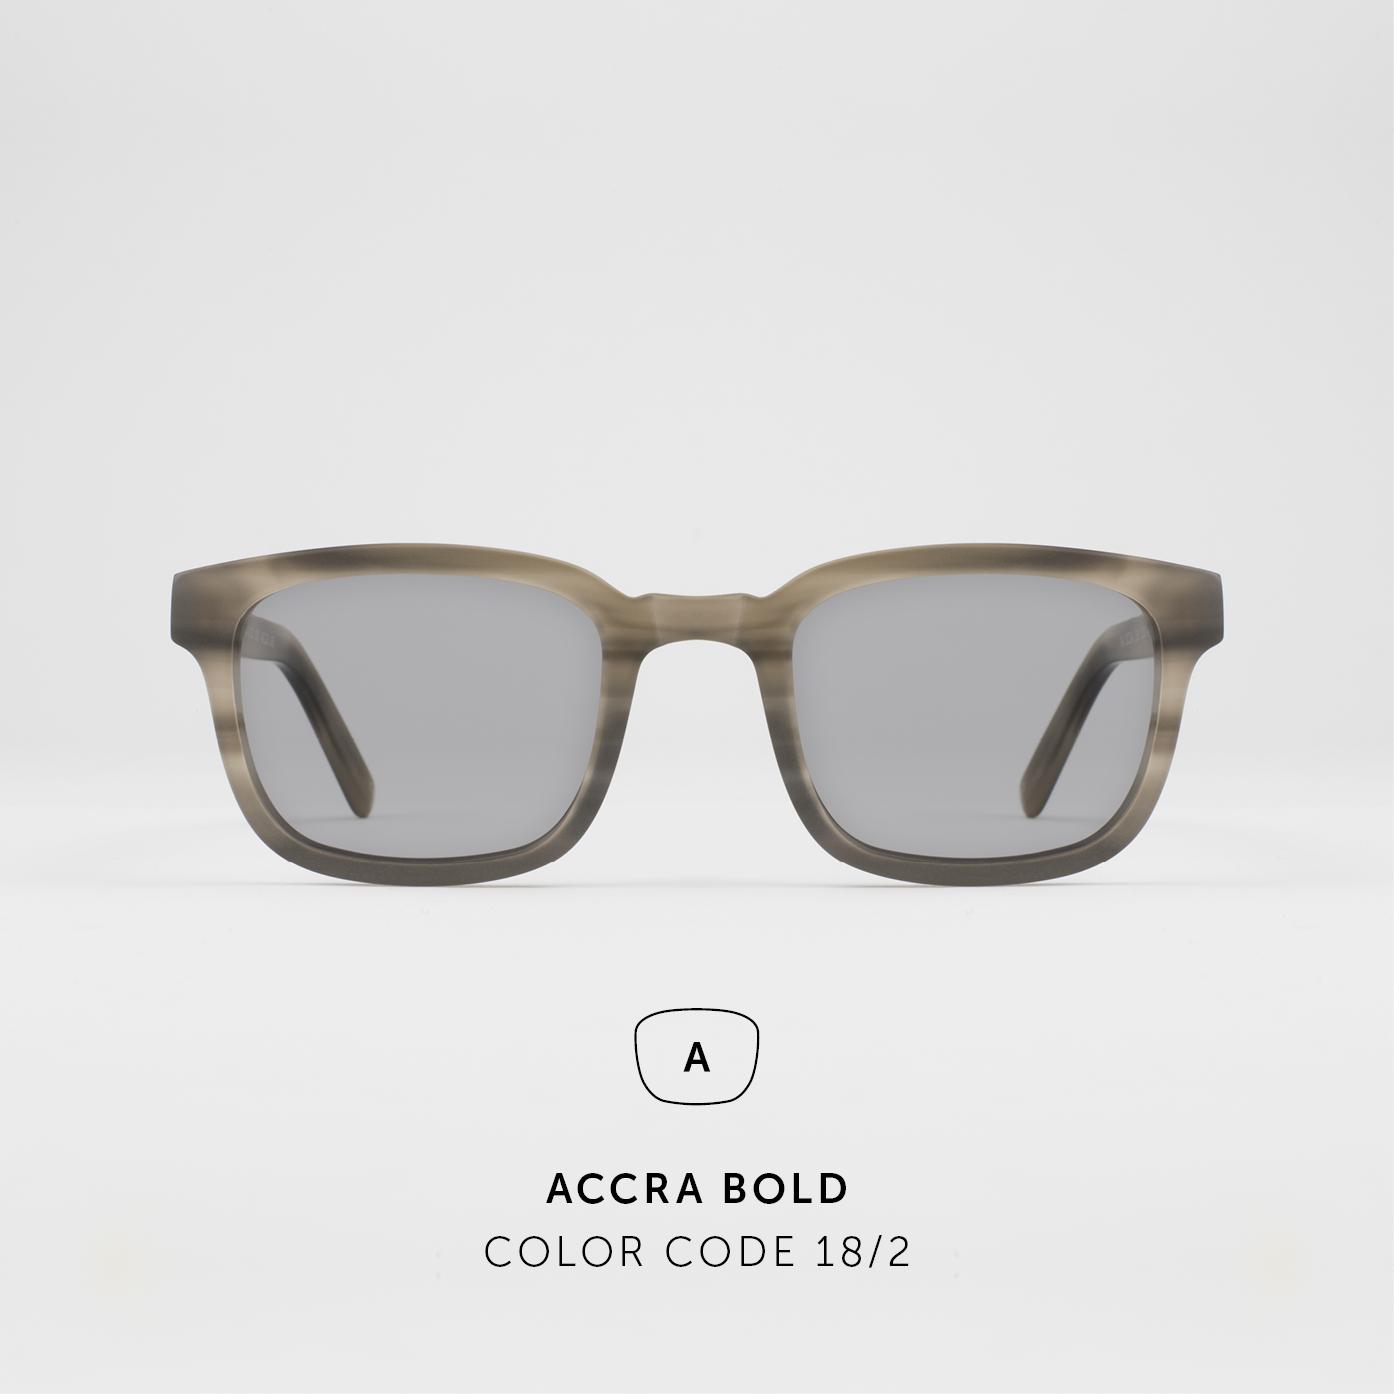 AccraBold56.jpg